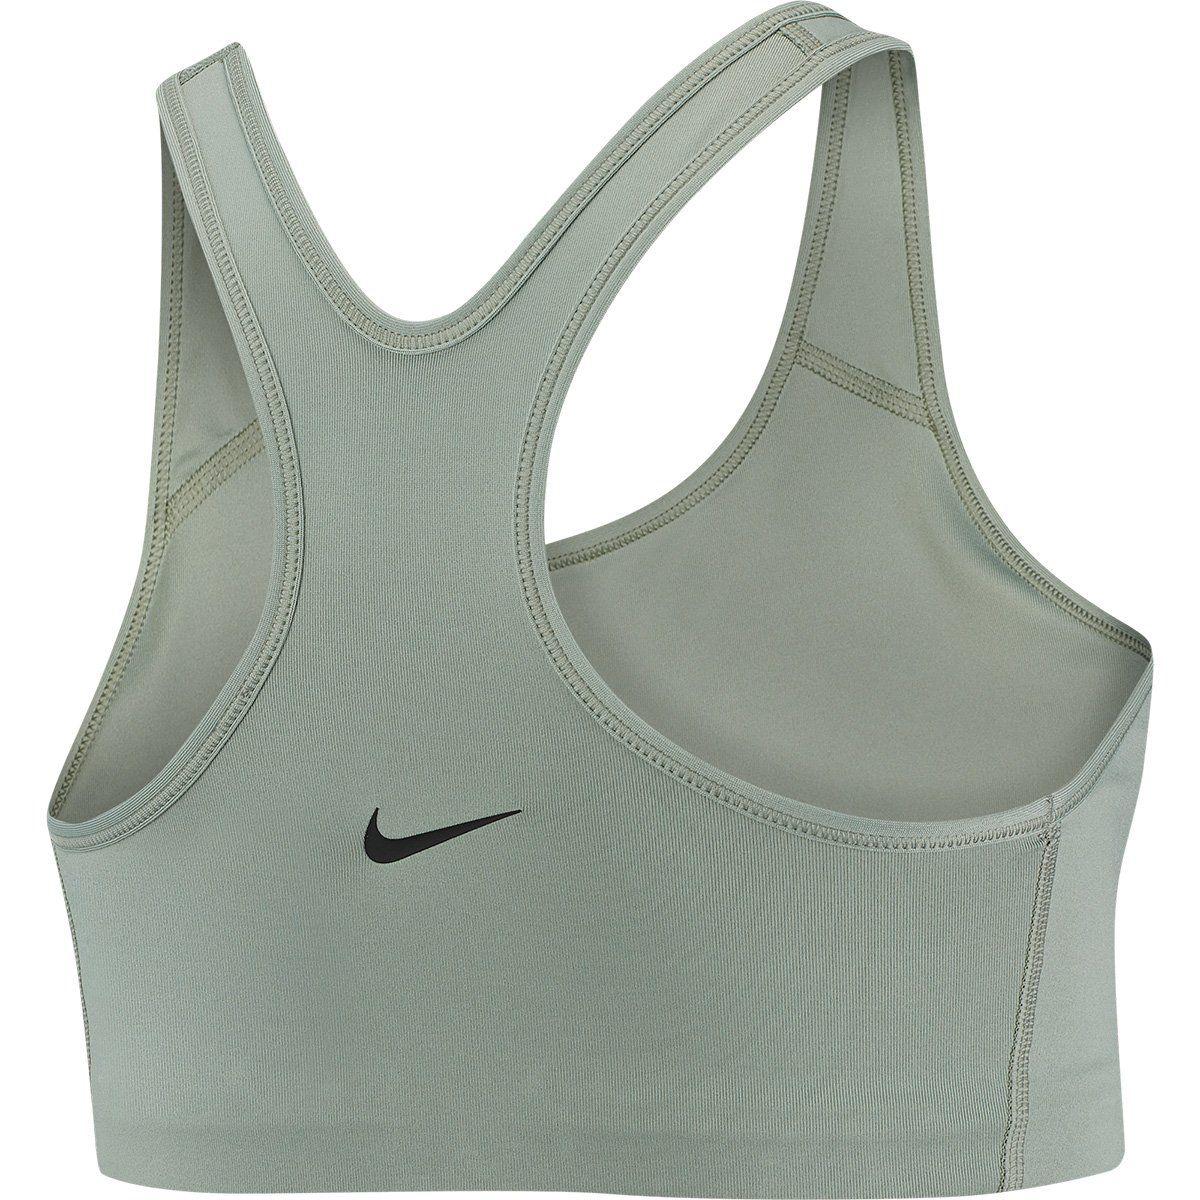 Top Curto Nike Rebel Swoosh Jdi Bra Alta Sustentação Feminino - Verde e Preto